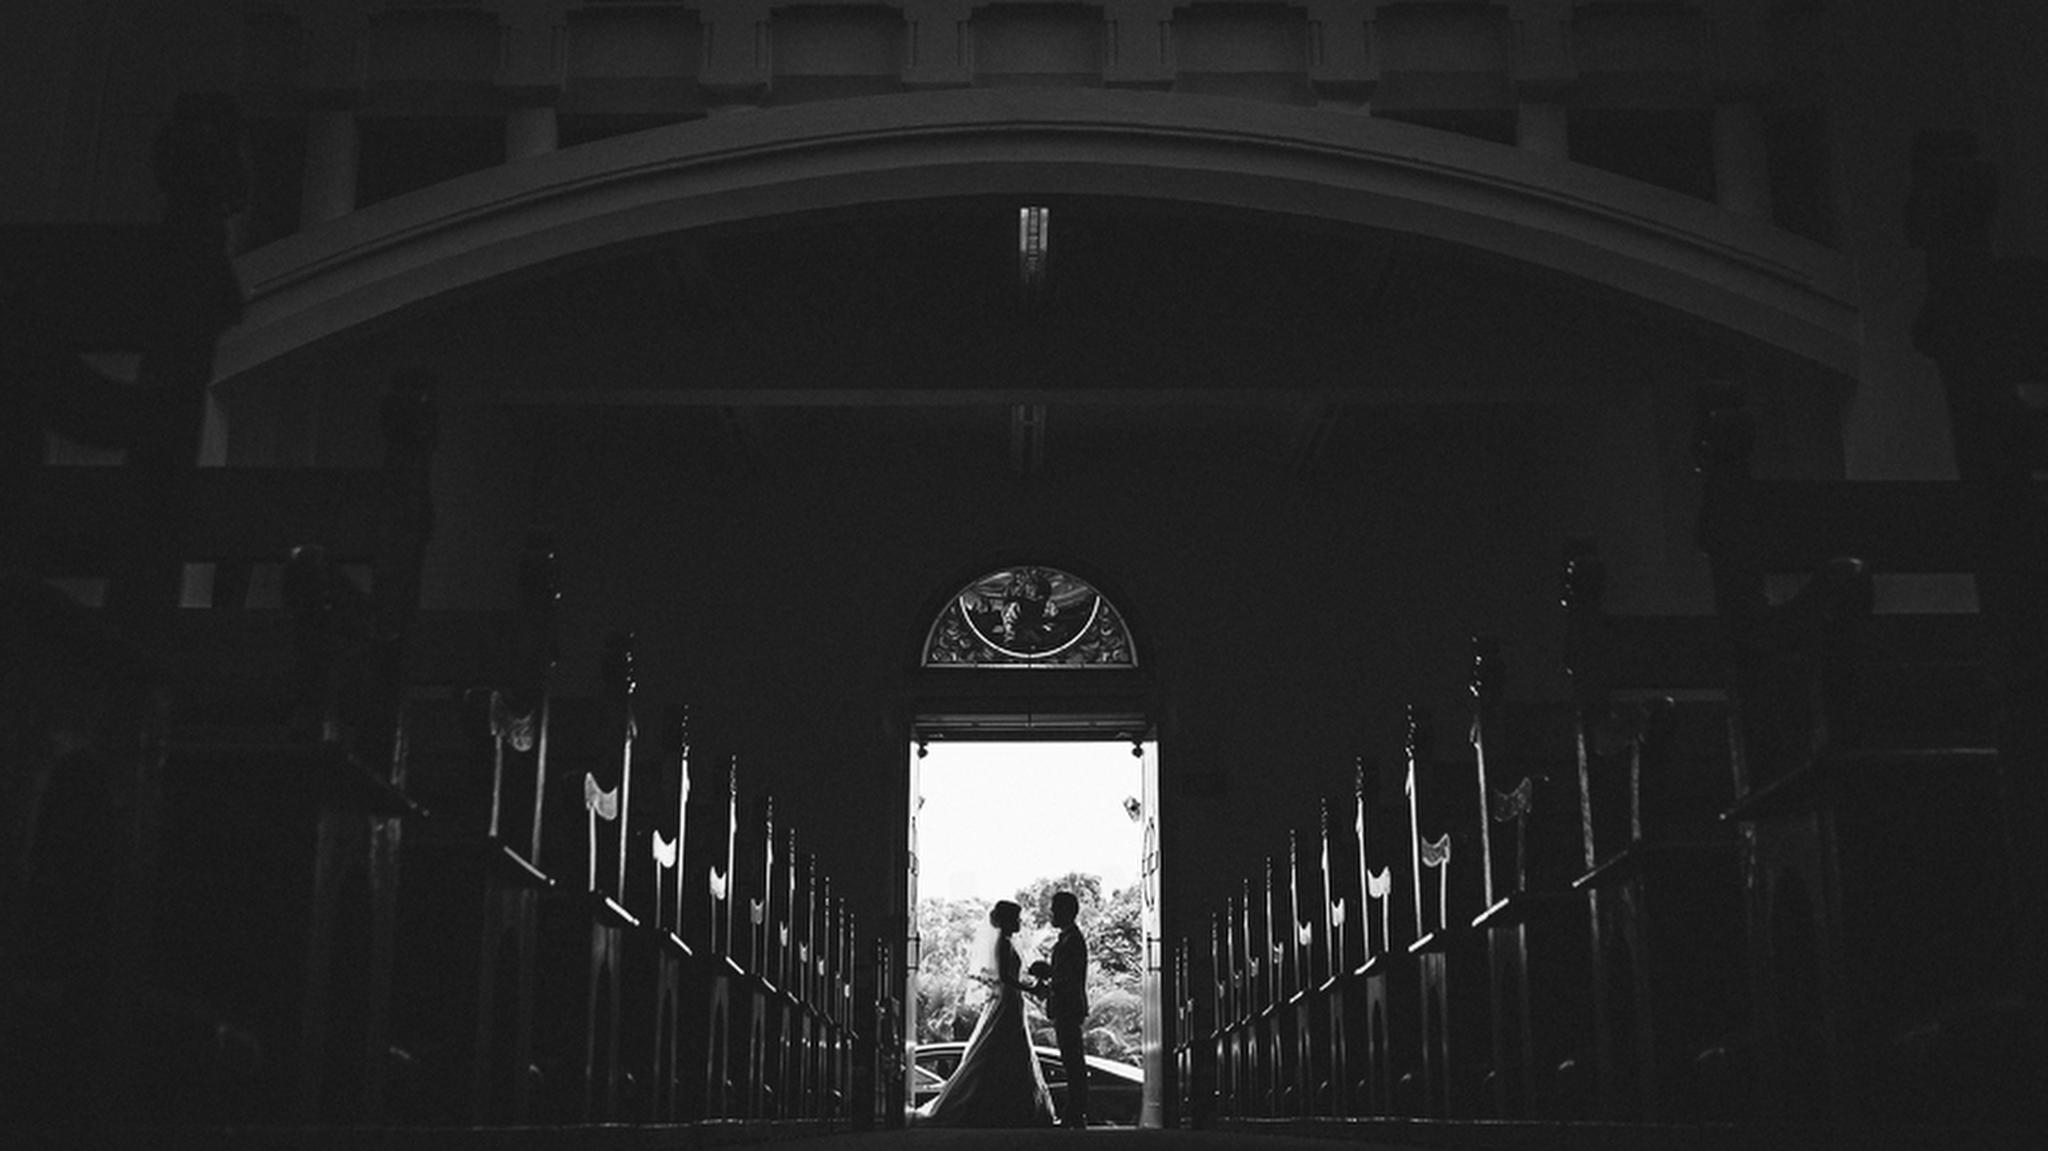 Singapore Wedding Photography - St Teresa Church Hotel Jen Gordon & Eleanor Actual Day Wedding (97 of 125).JPG